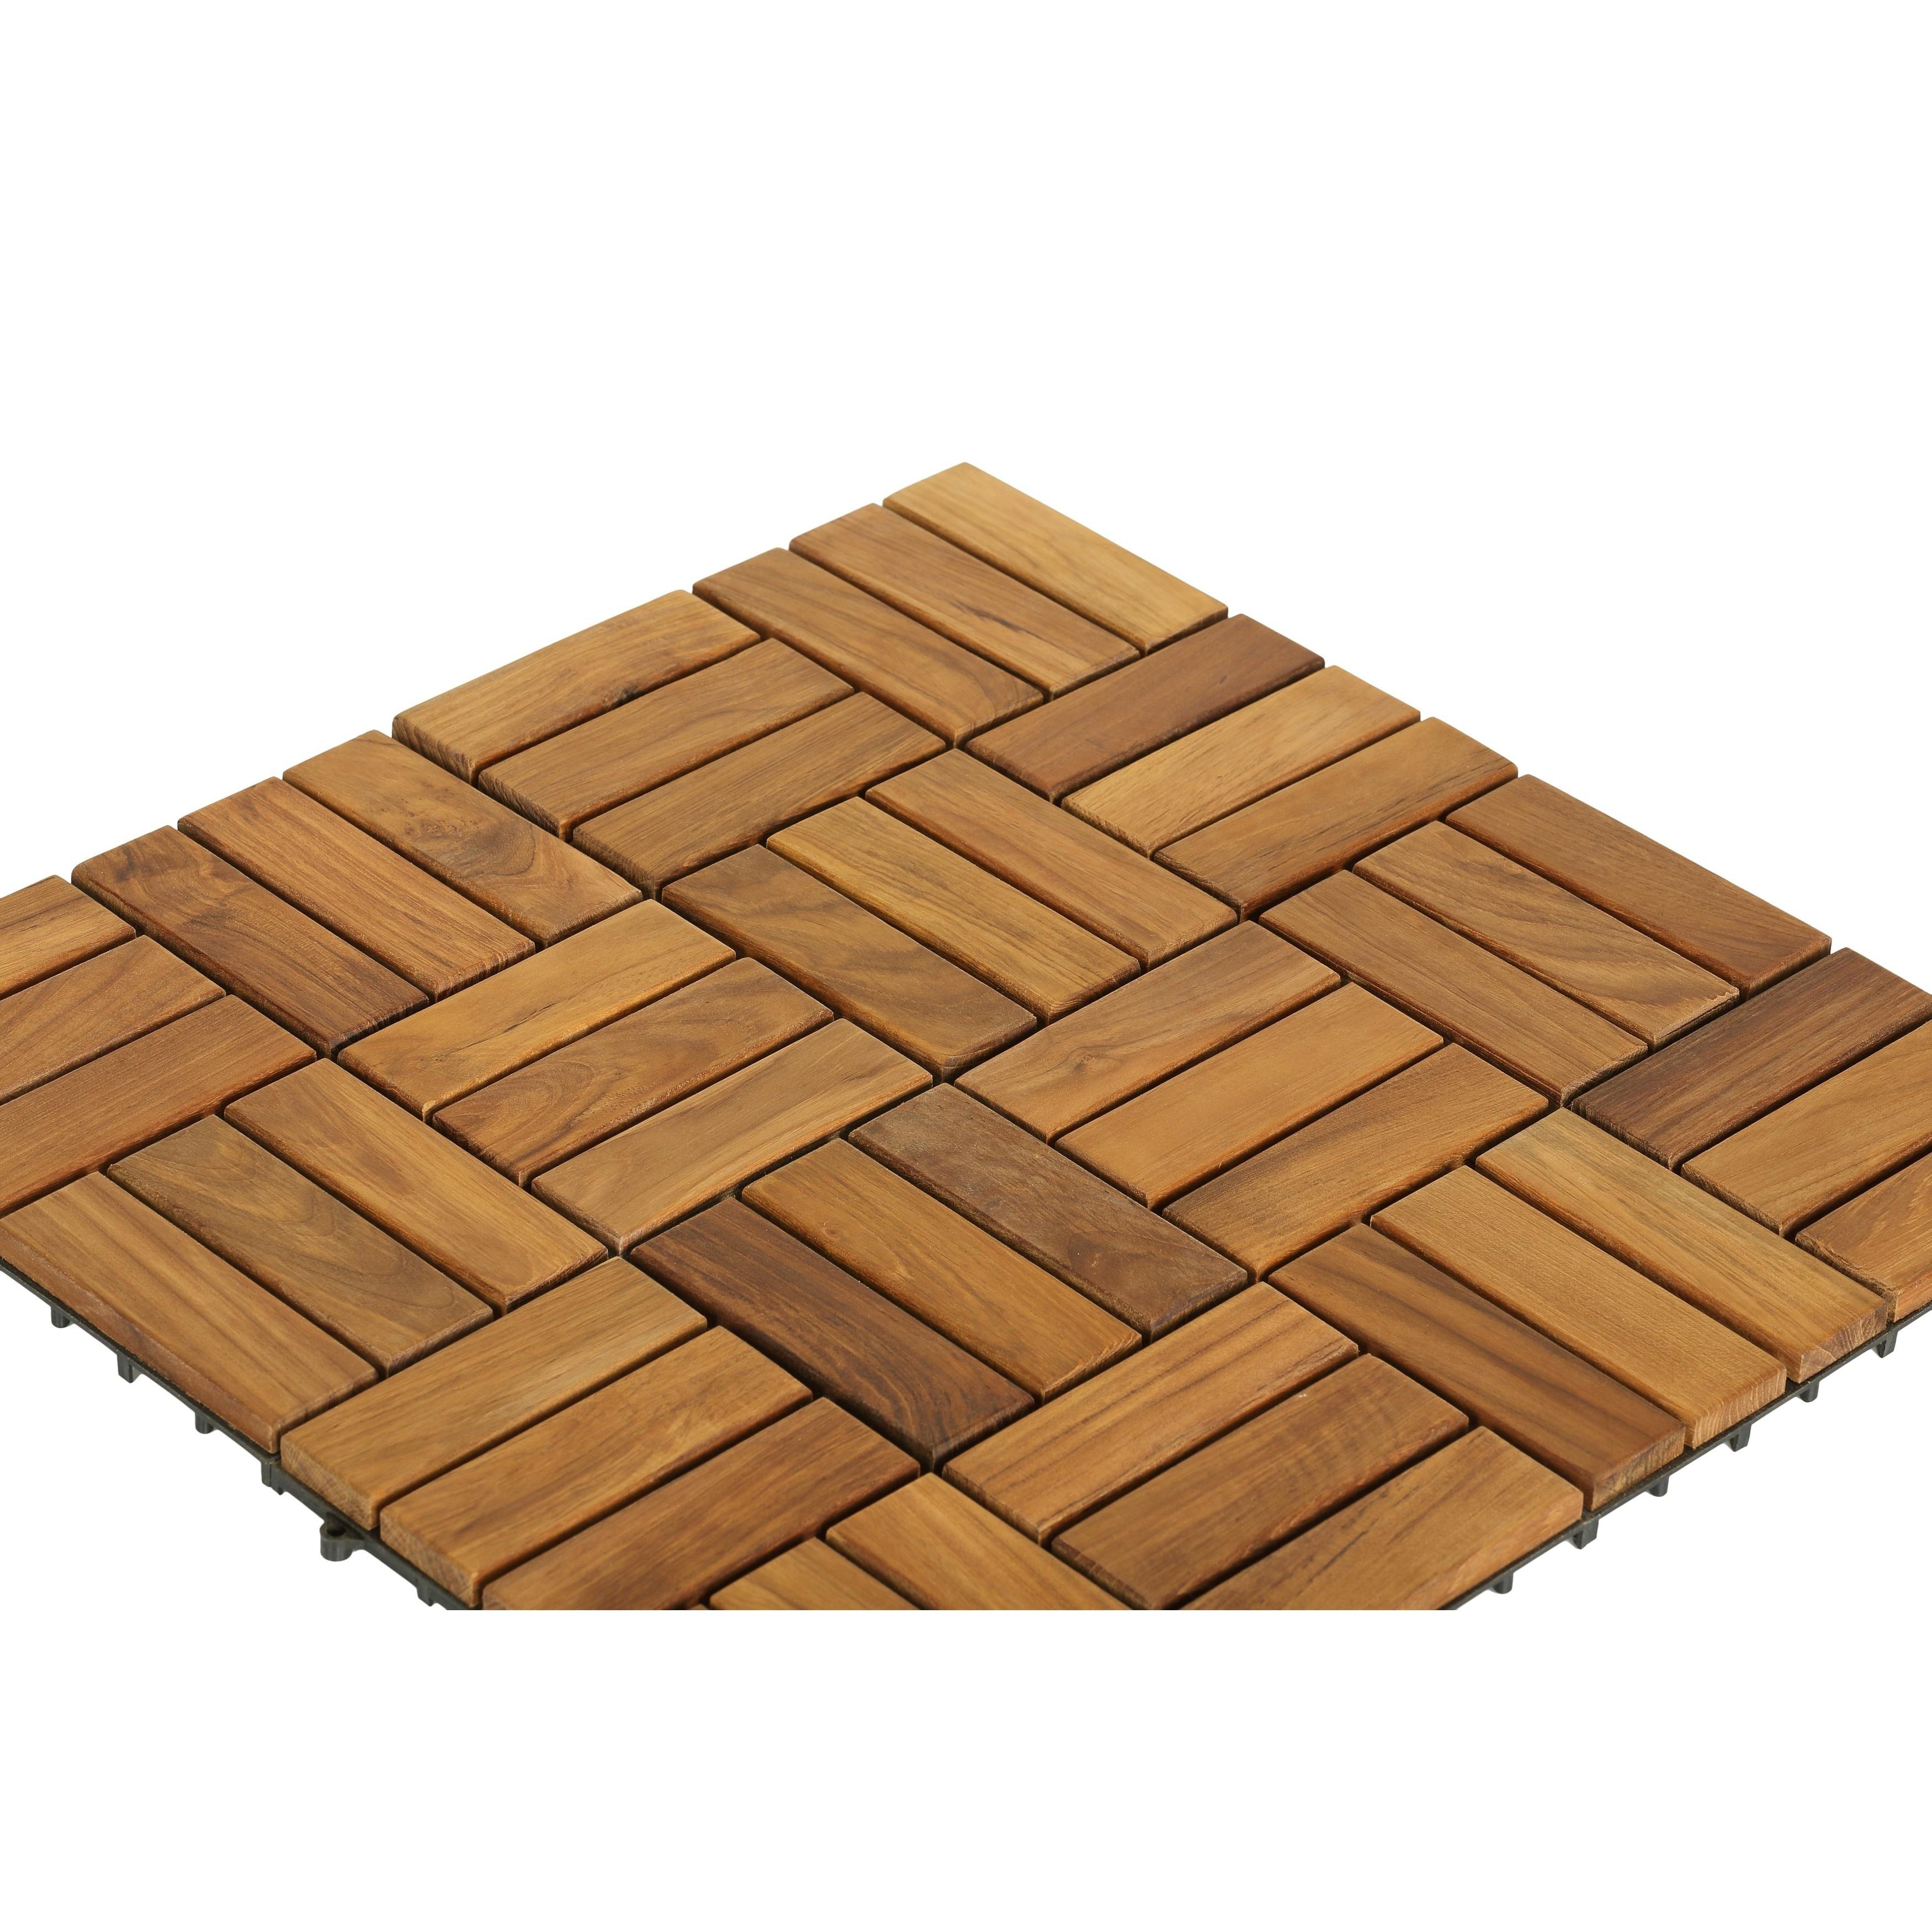 Shop Bare Decor EZFloor Solid Teak Wood Interlocking Flooring Tiles - Teak patio flooring 12x12